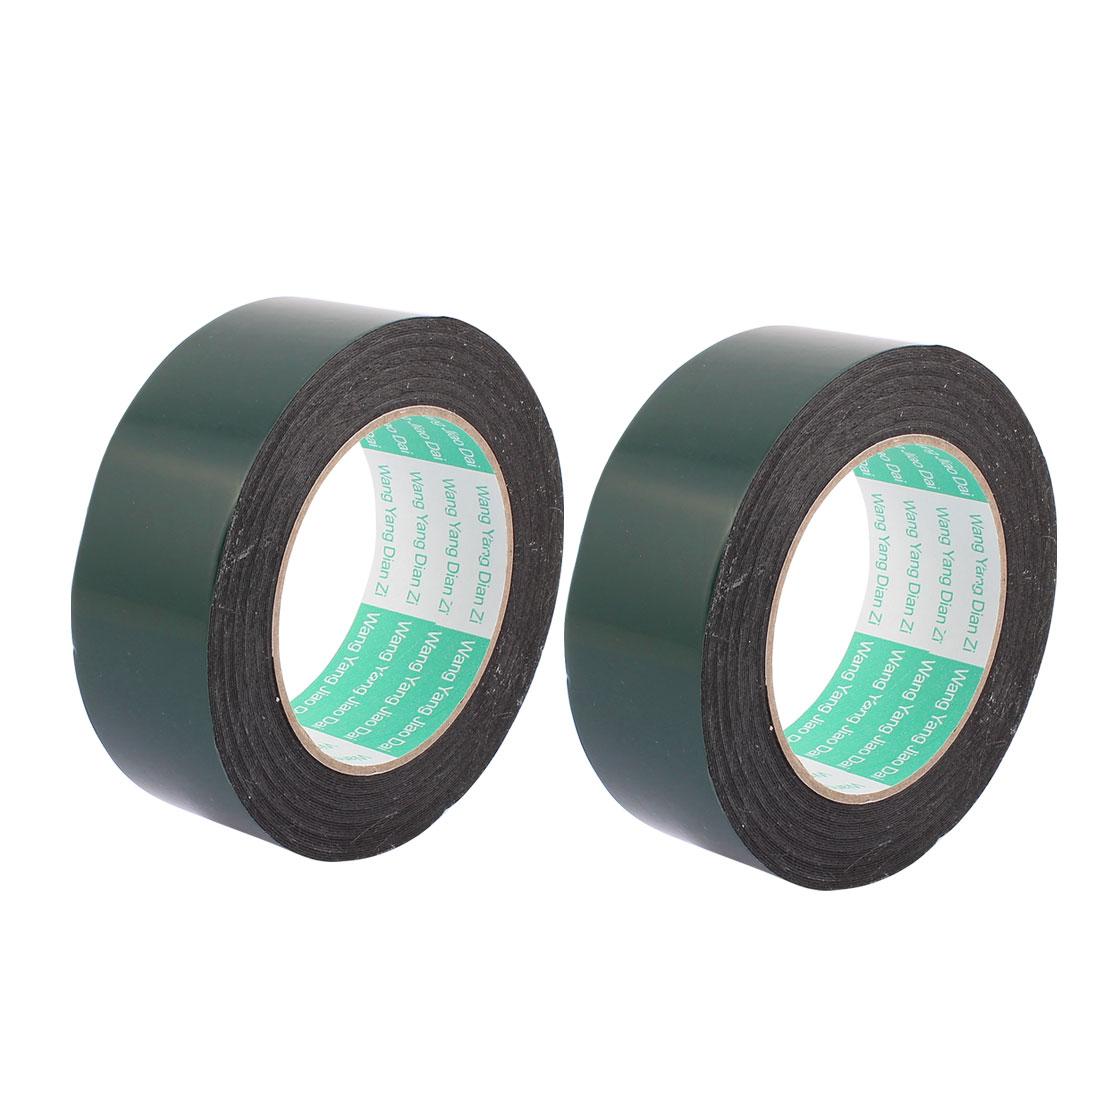 2 Pcs 3CM Width 10M Length 0.5MM Thick Dual Sided Sealing Shockproof Sponge Tape